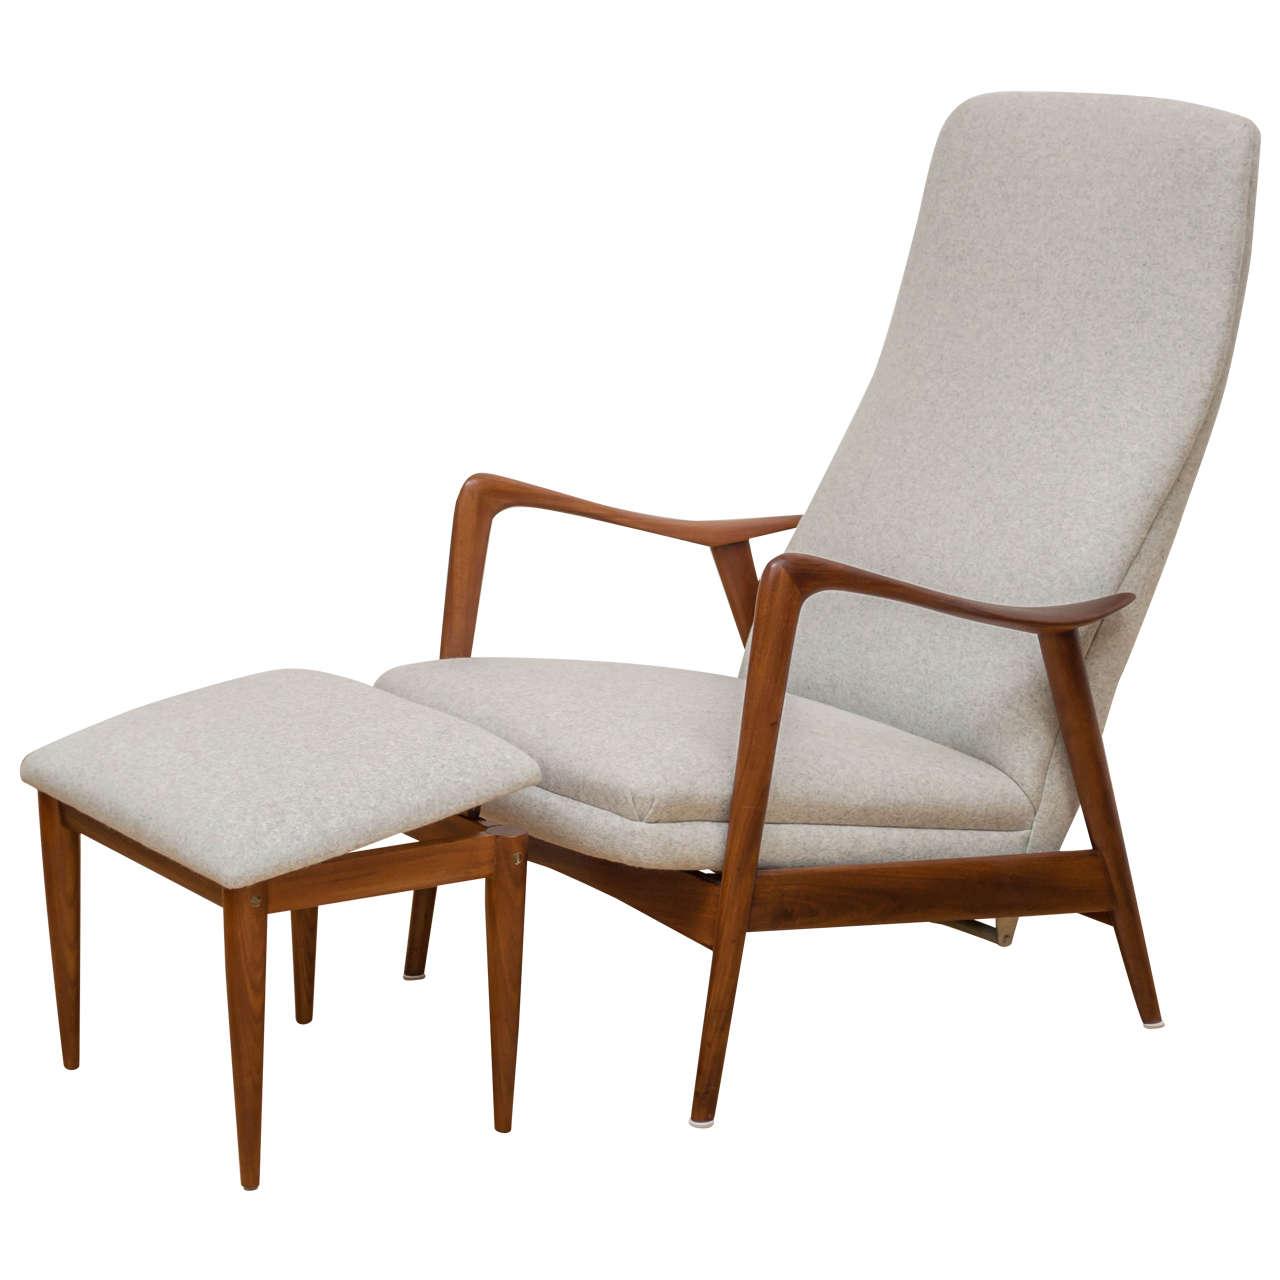 Westnofa Teak Chair And Ottoman At 1stdibs